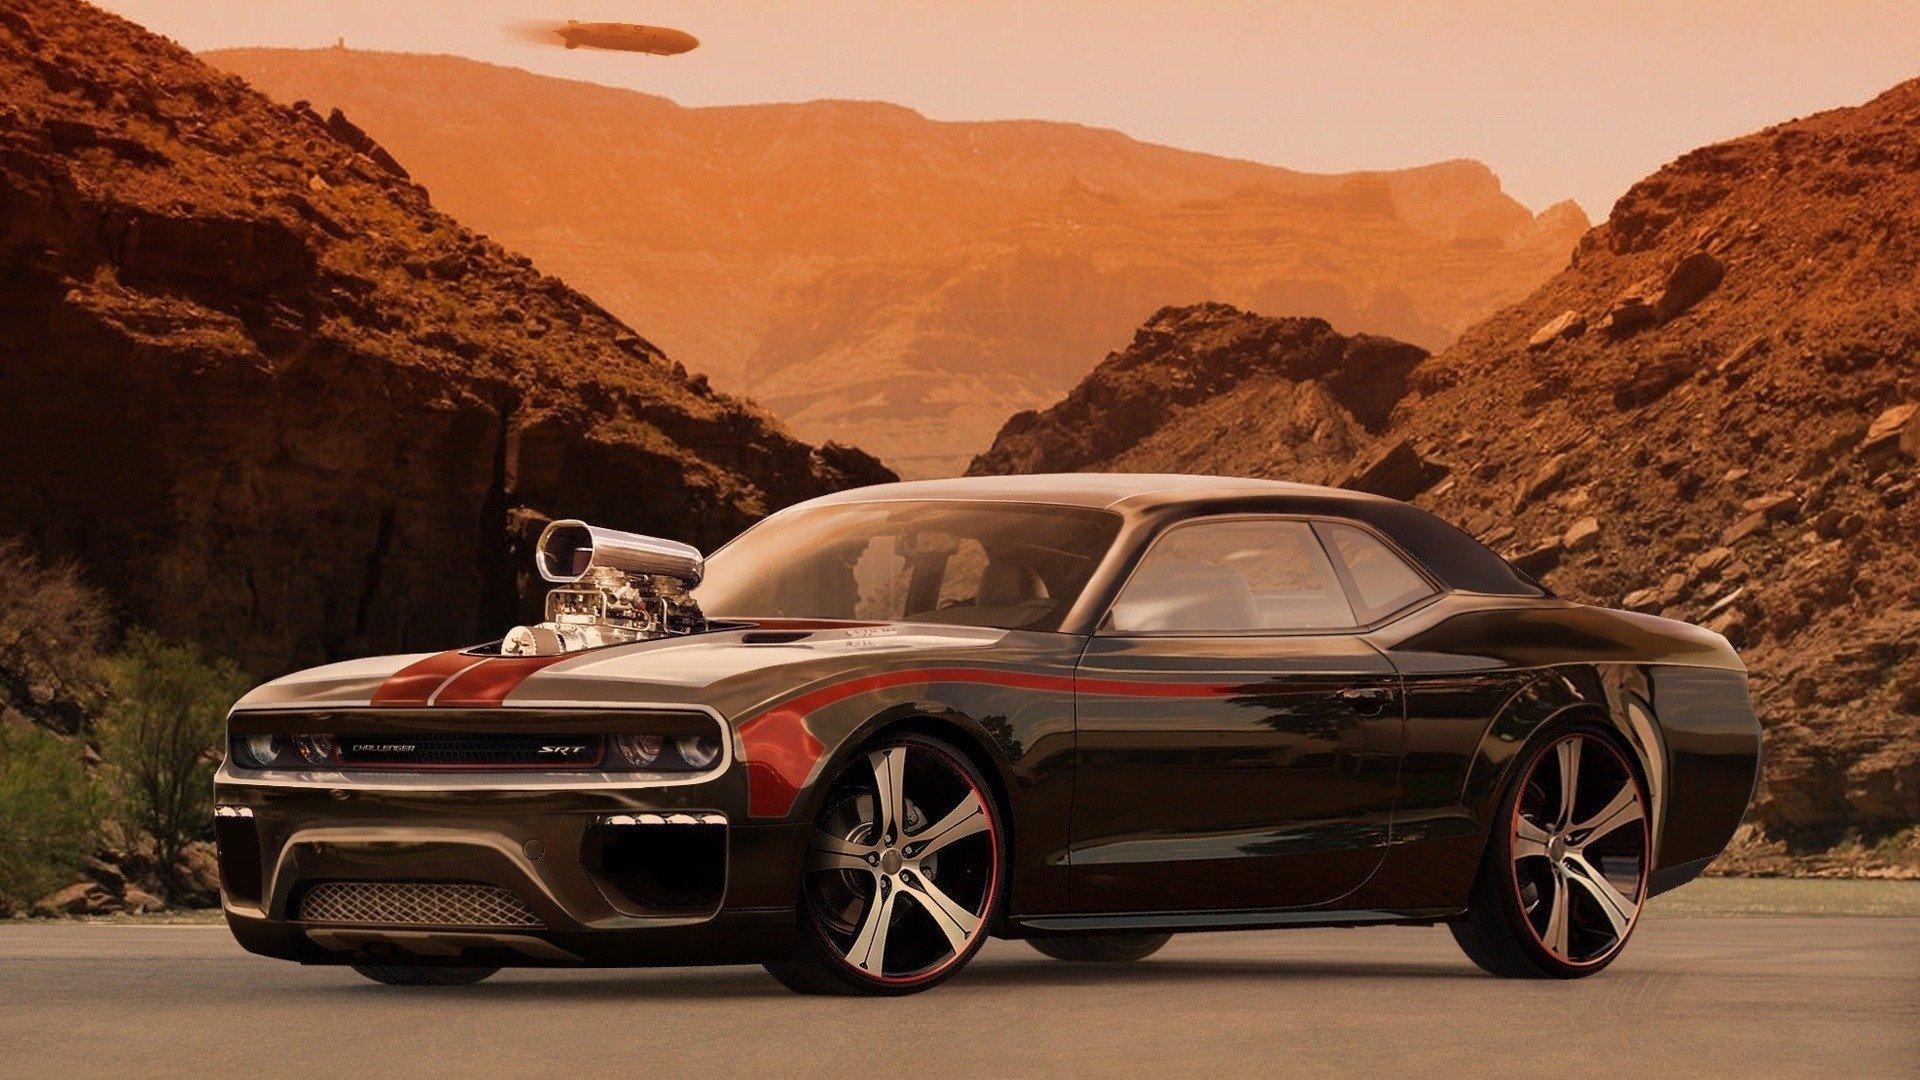 car cool wallpaper desktop wallpapers speedy muscle 1920x1080